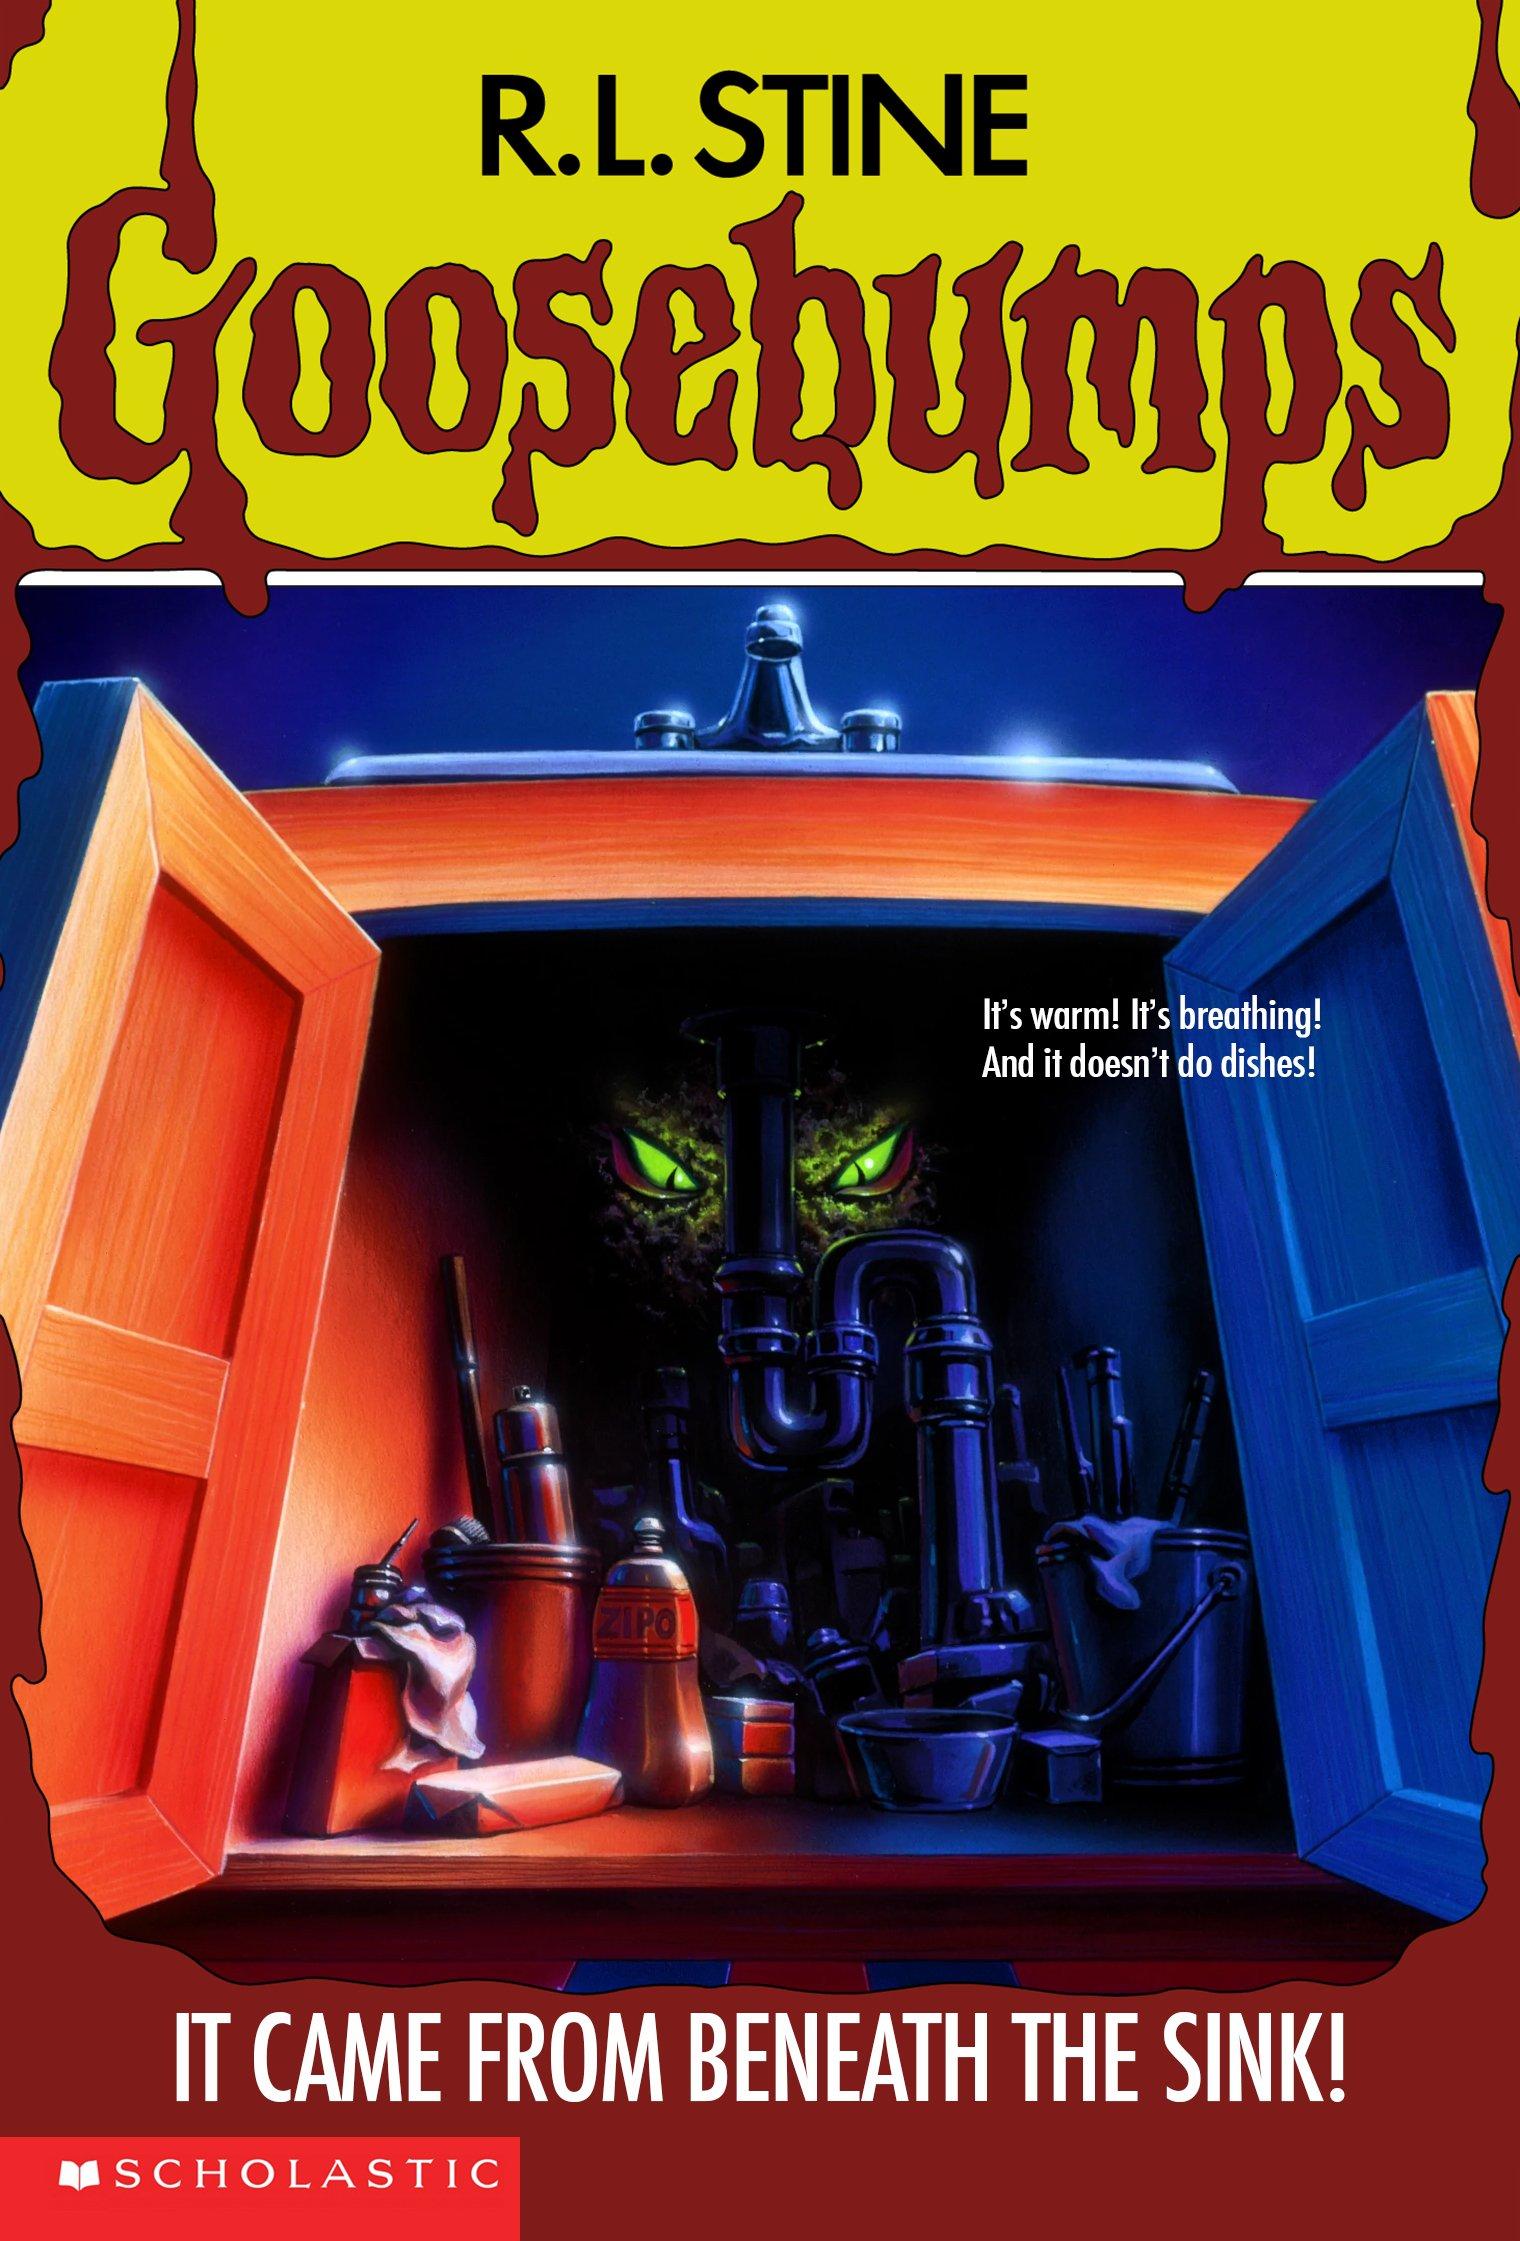 Pin On Goosebumps Books